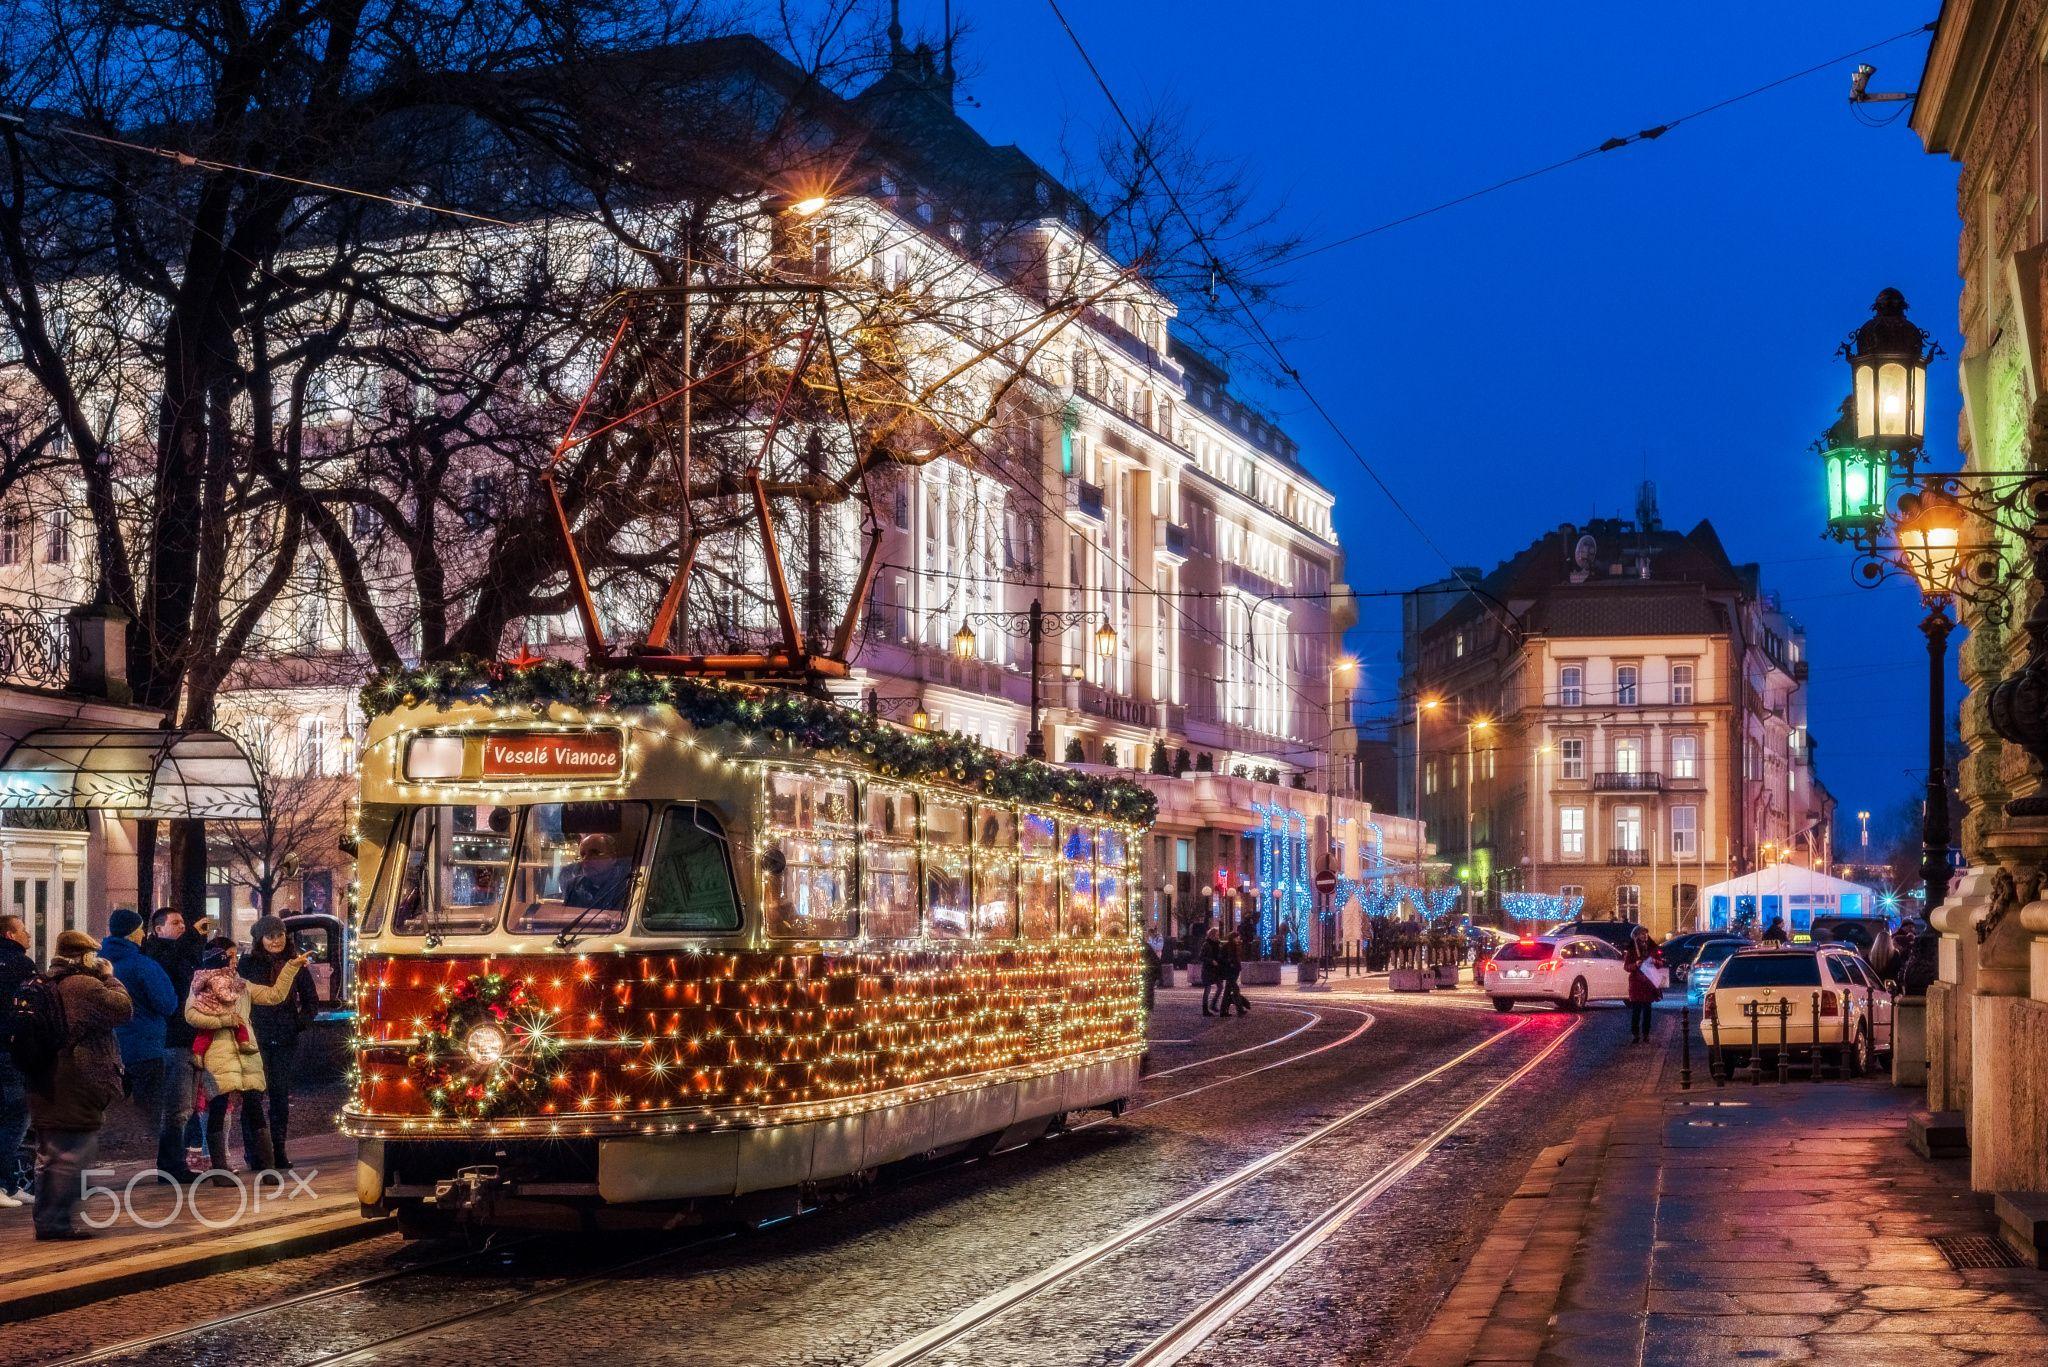 Christmas Bratislava.Christmas Tram This Photogenic Christmas Tram Is Carrying